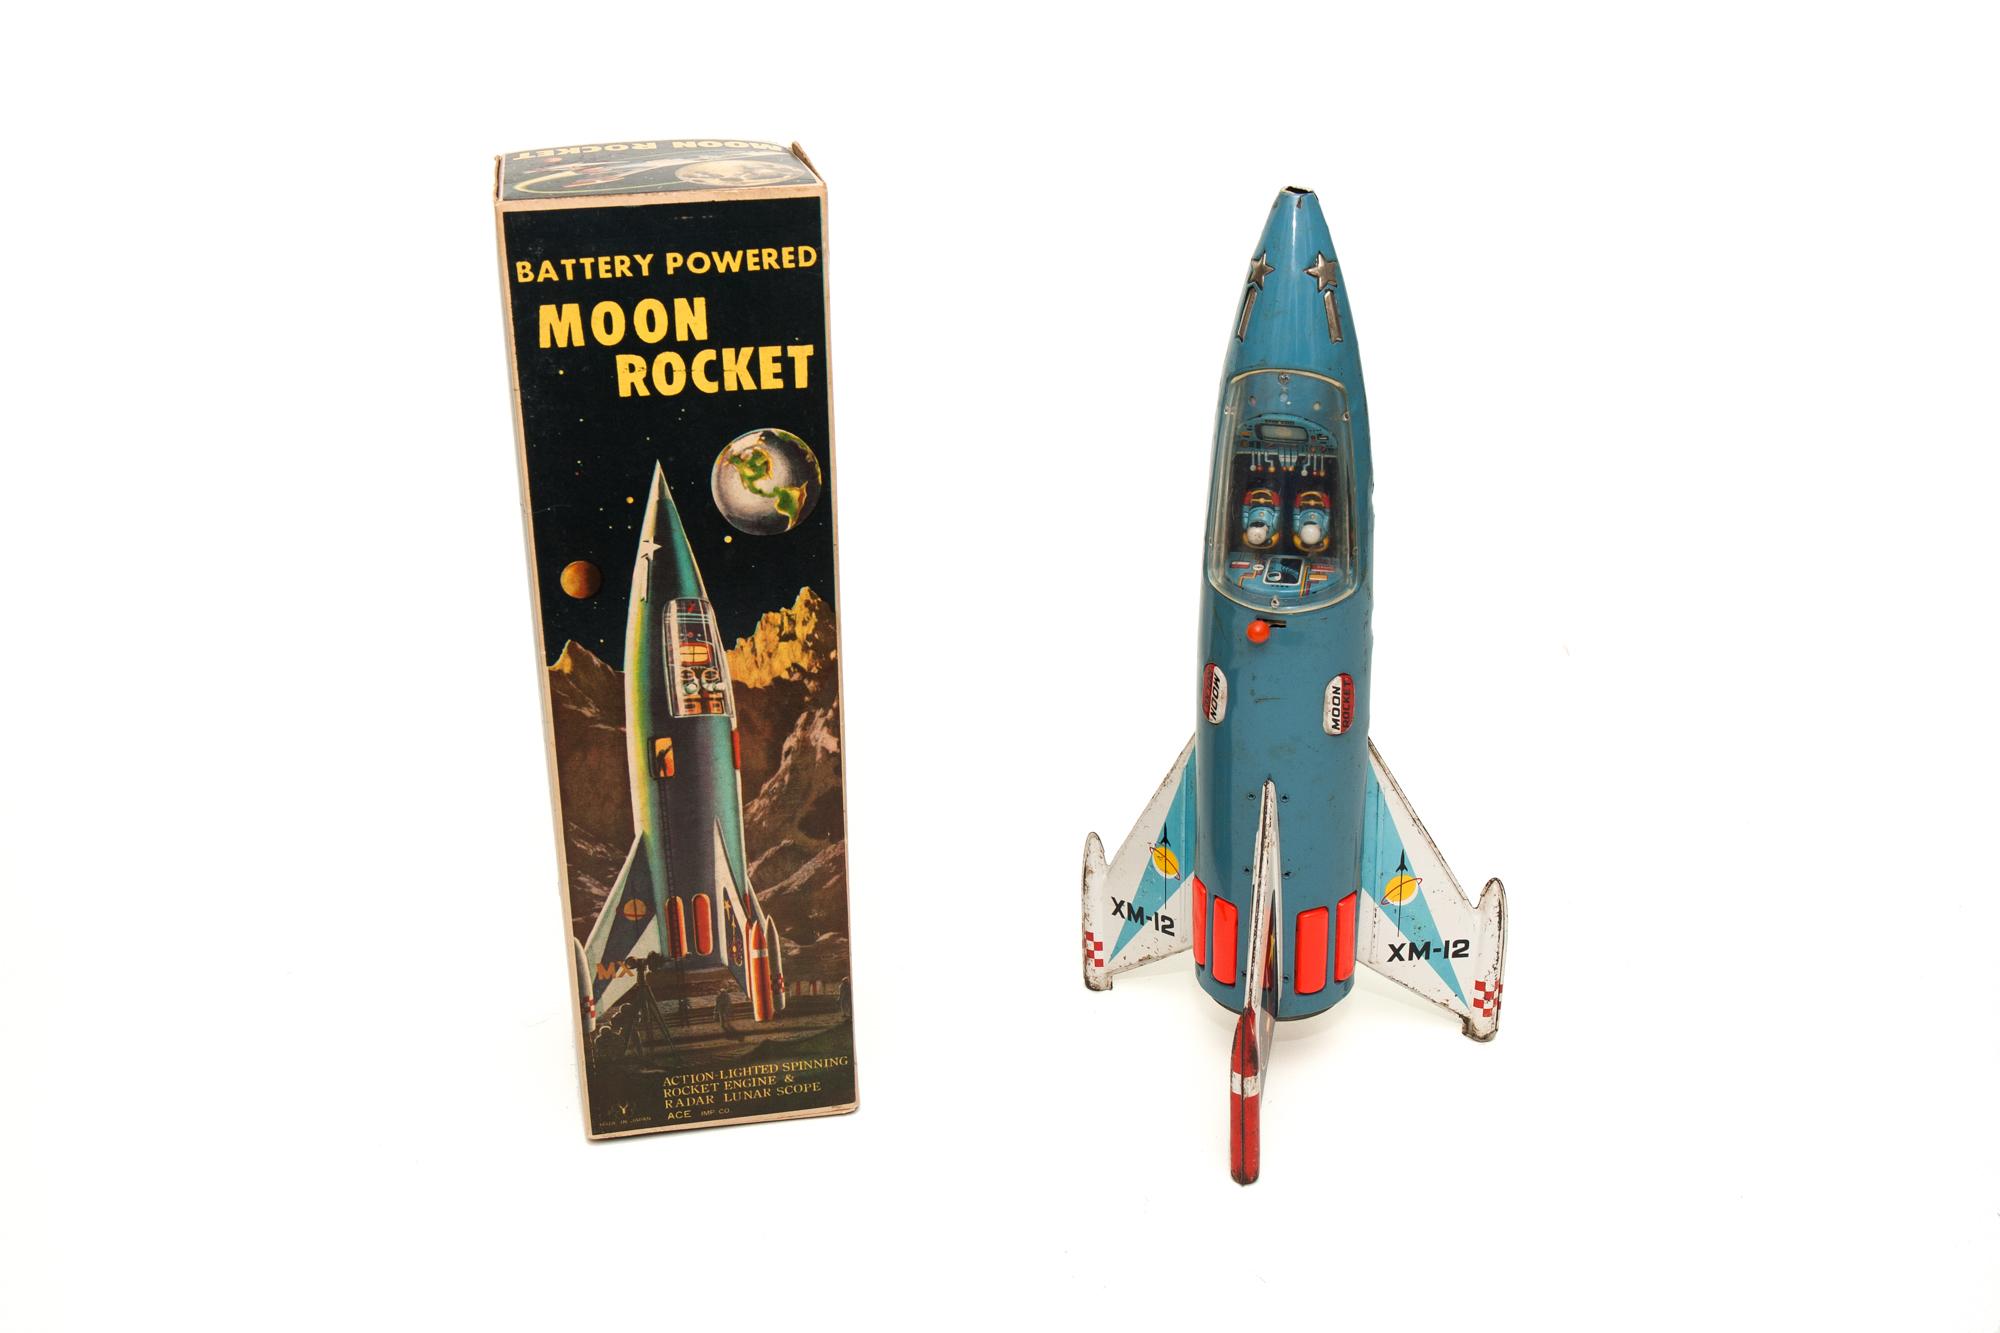 Moon Rocket XM-12 with Box (Yonezawa 1956)